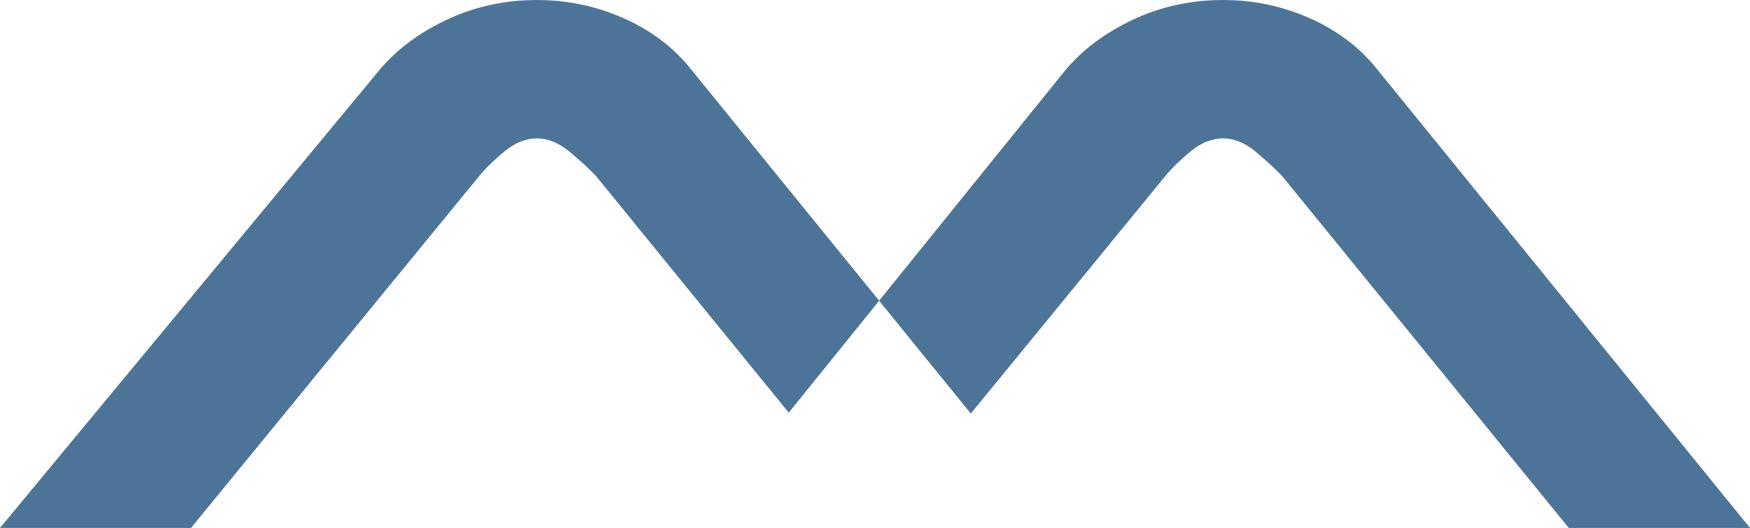 MARSH Graphic Design